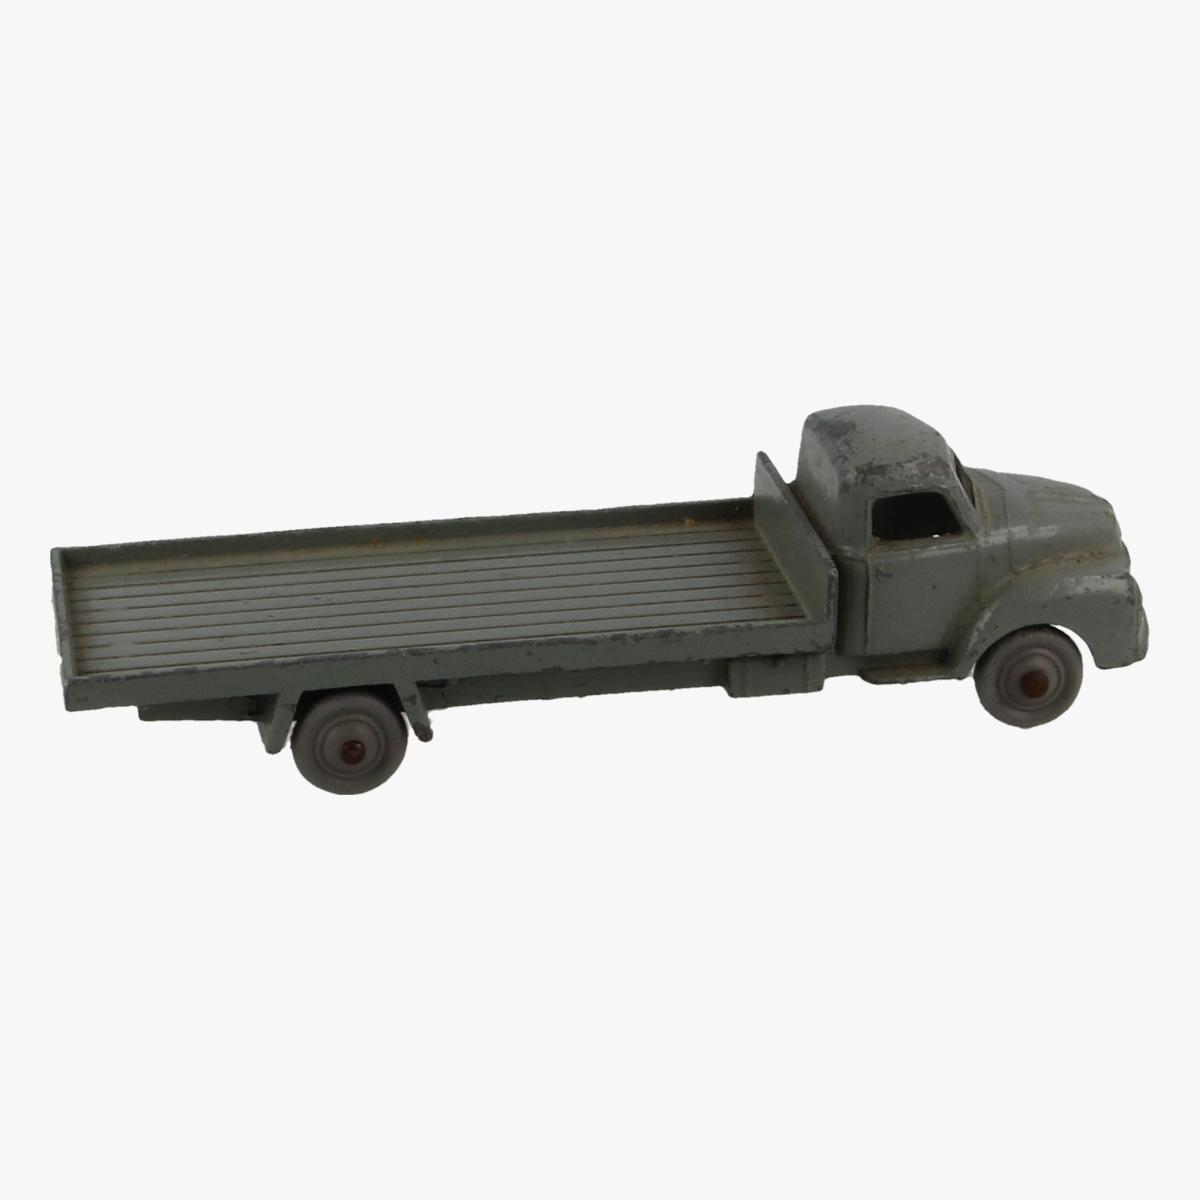 Afbeeldingen van Dublo Dinky Toys oplegger, Meccano LTD